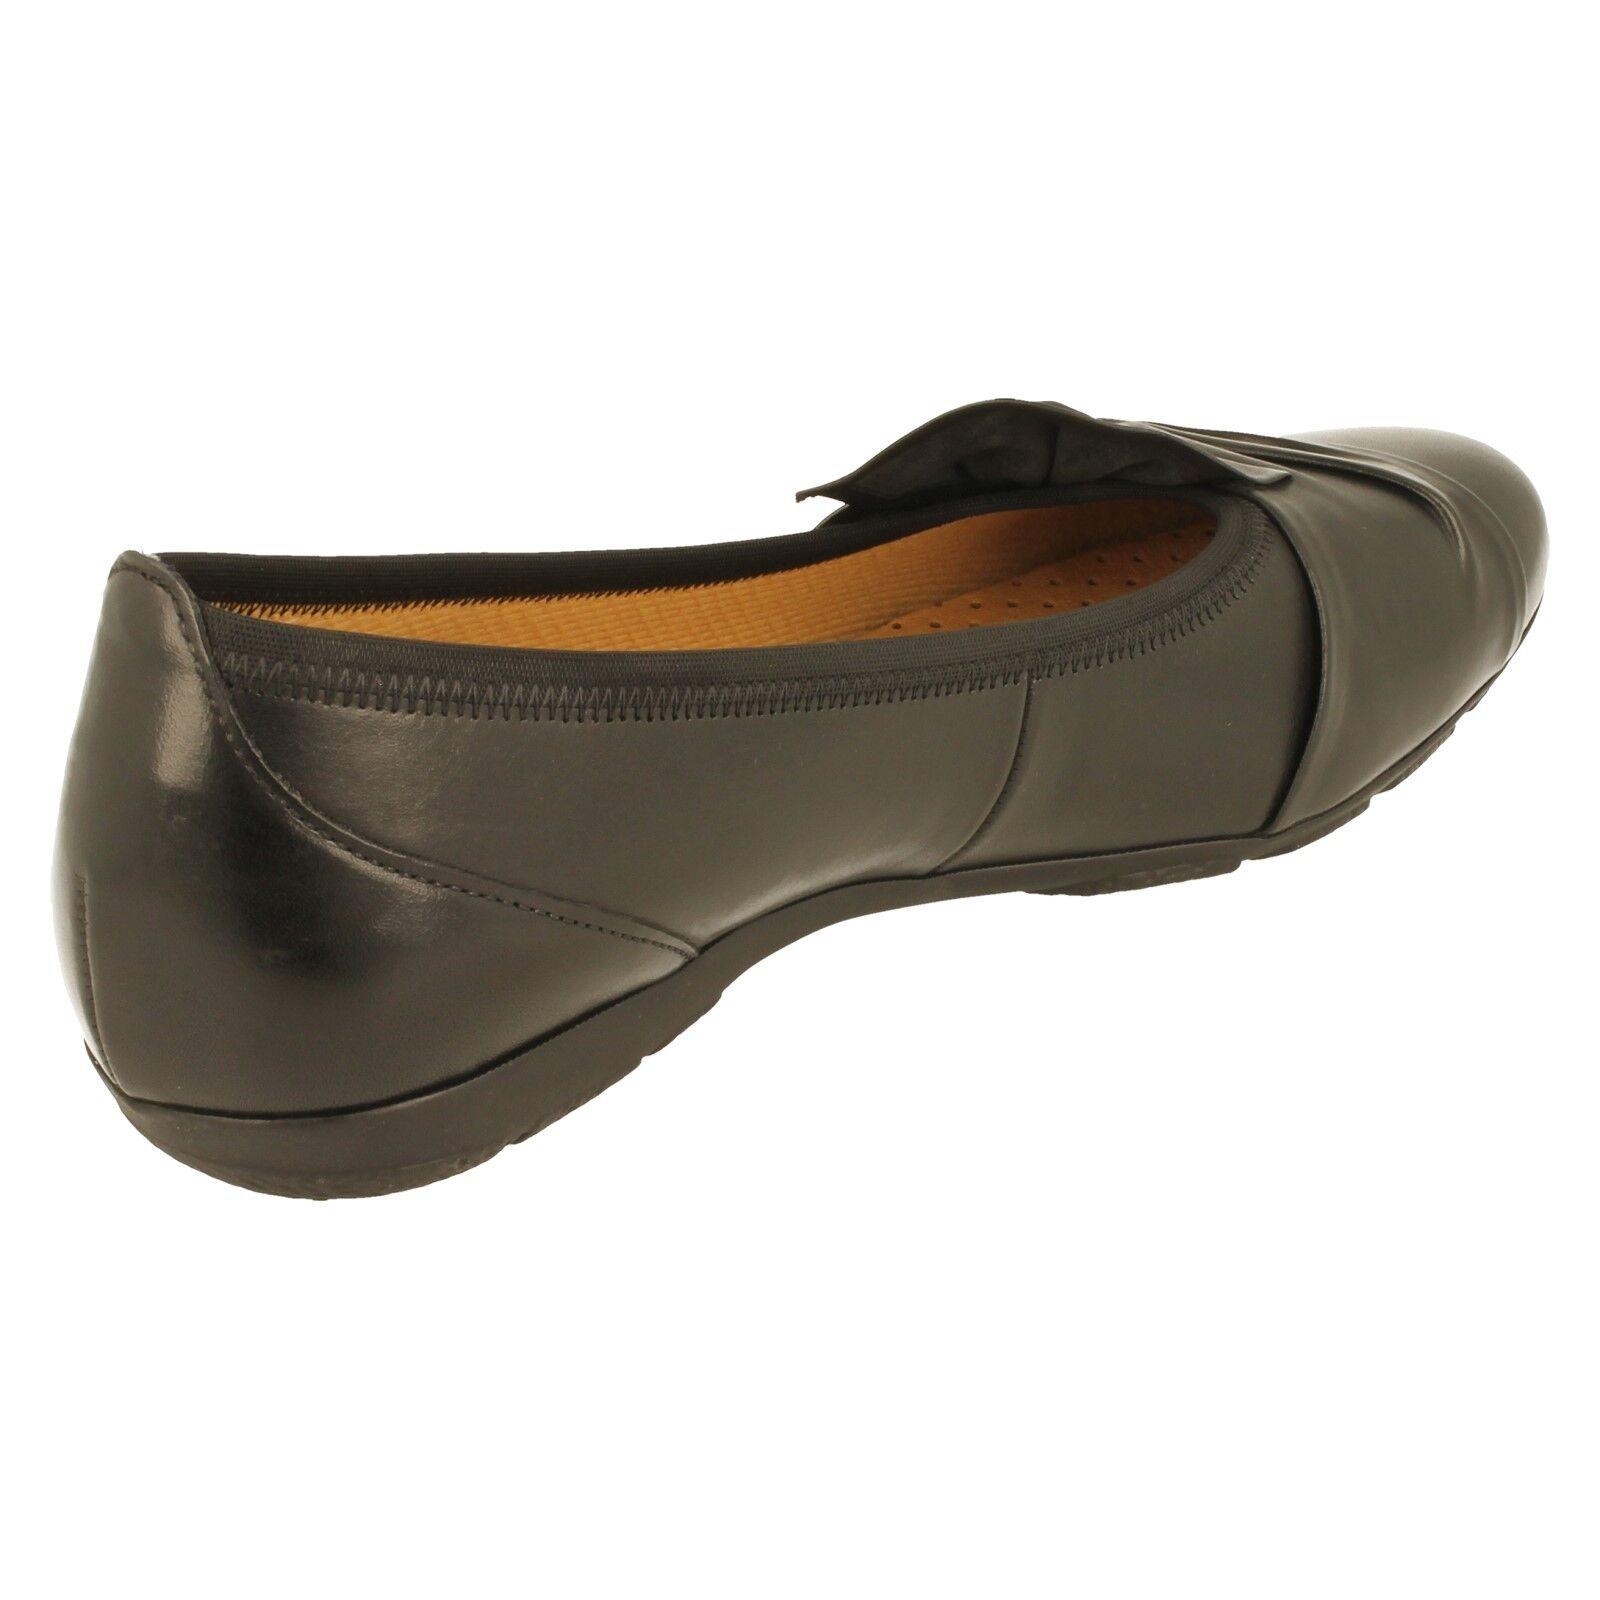 Ladies Gabor Flats Style - 94150 94150 - ad69fa